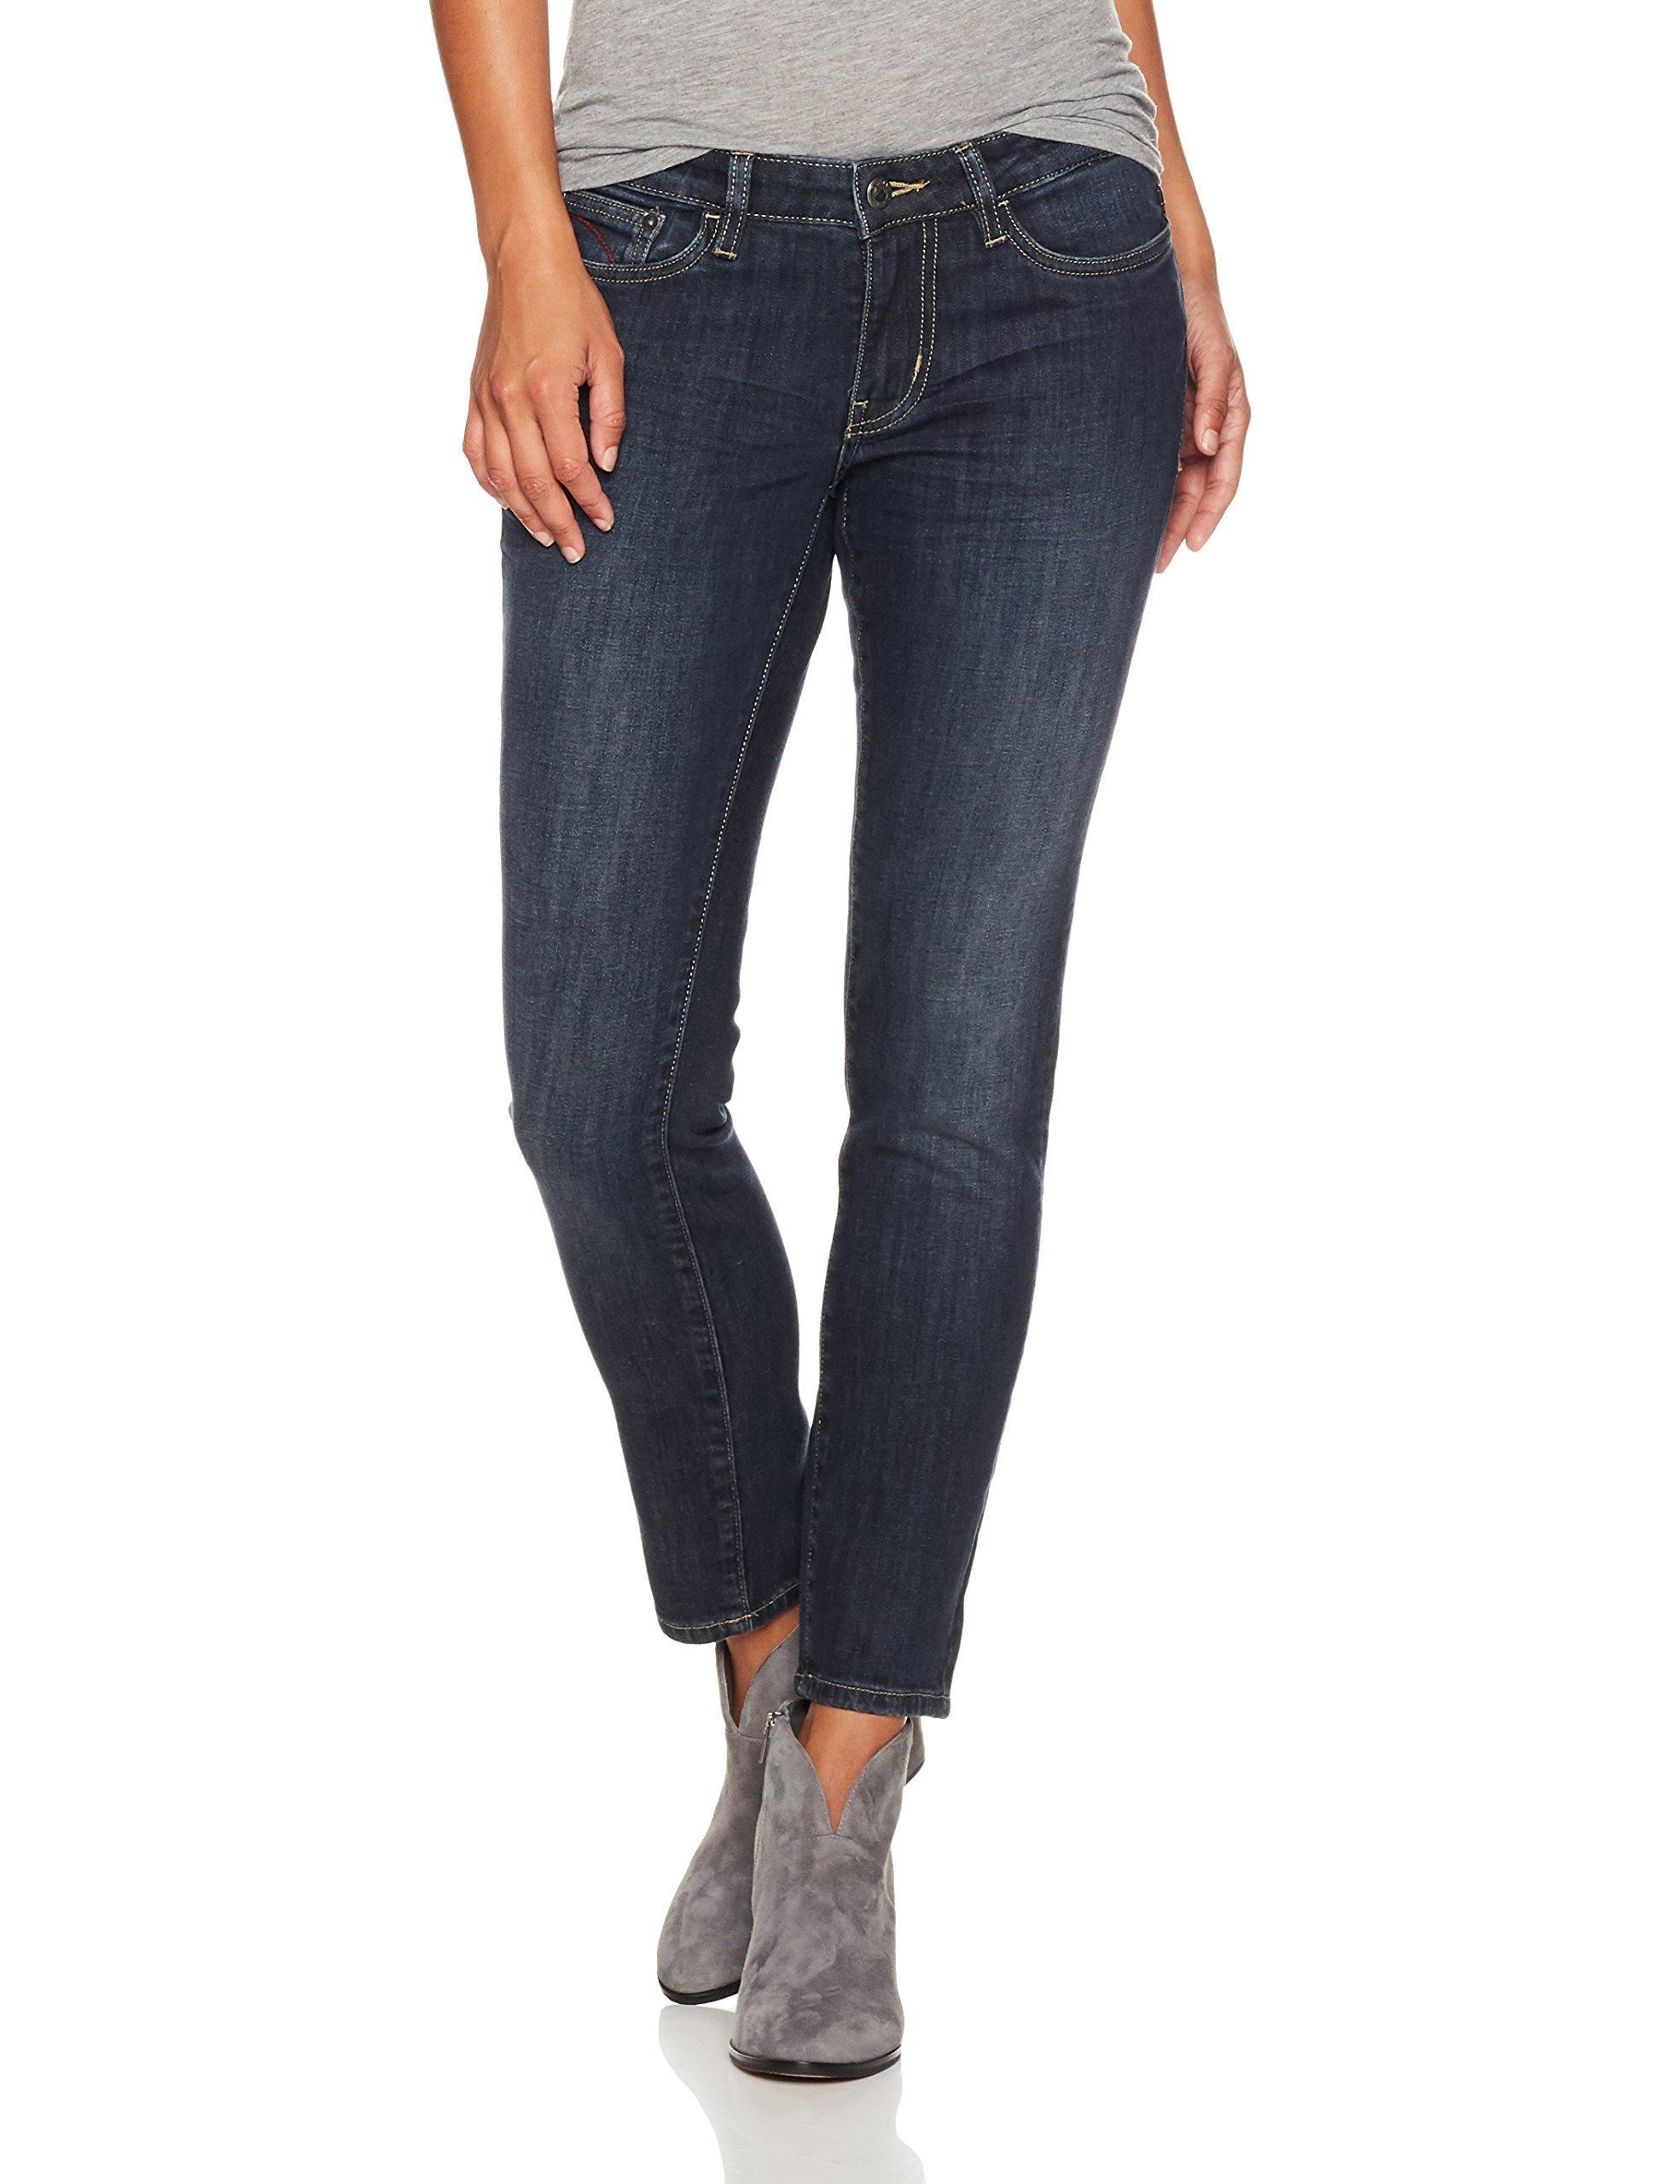 Mountain Khakis Women's Genevieve Skinny Jean Classic Fit, Dark Wash, 12 Regular